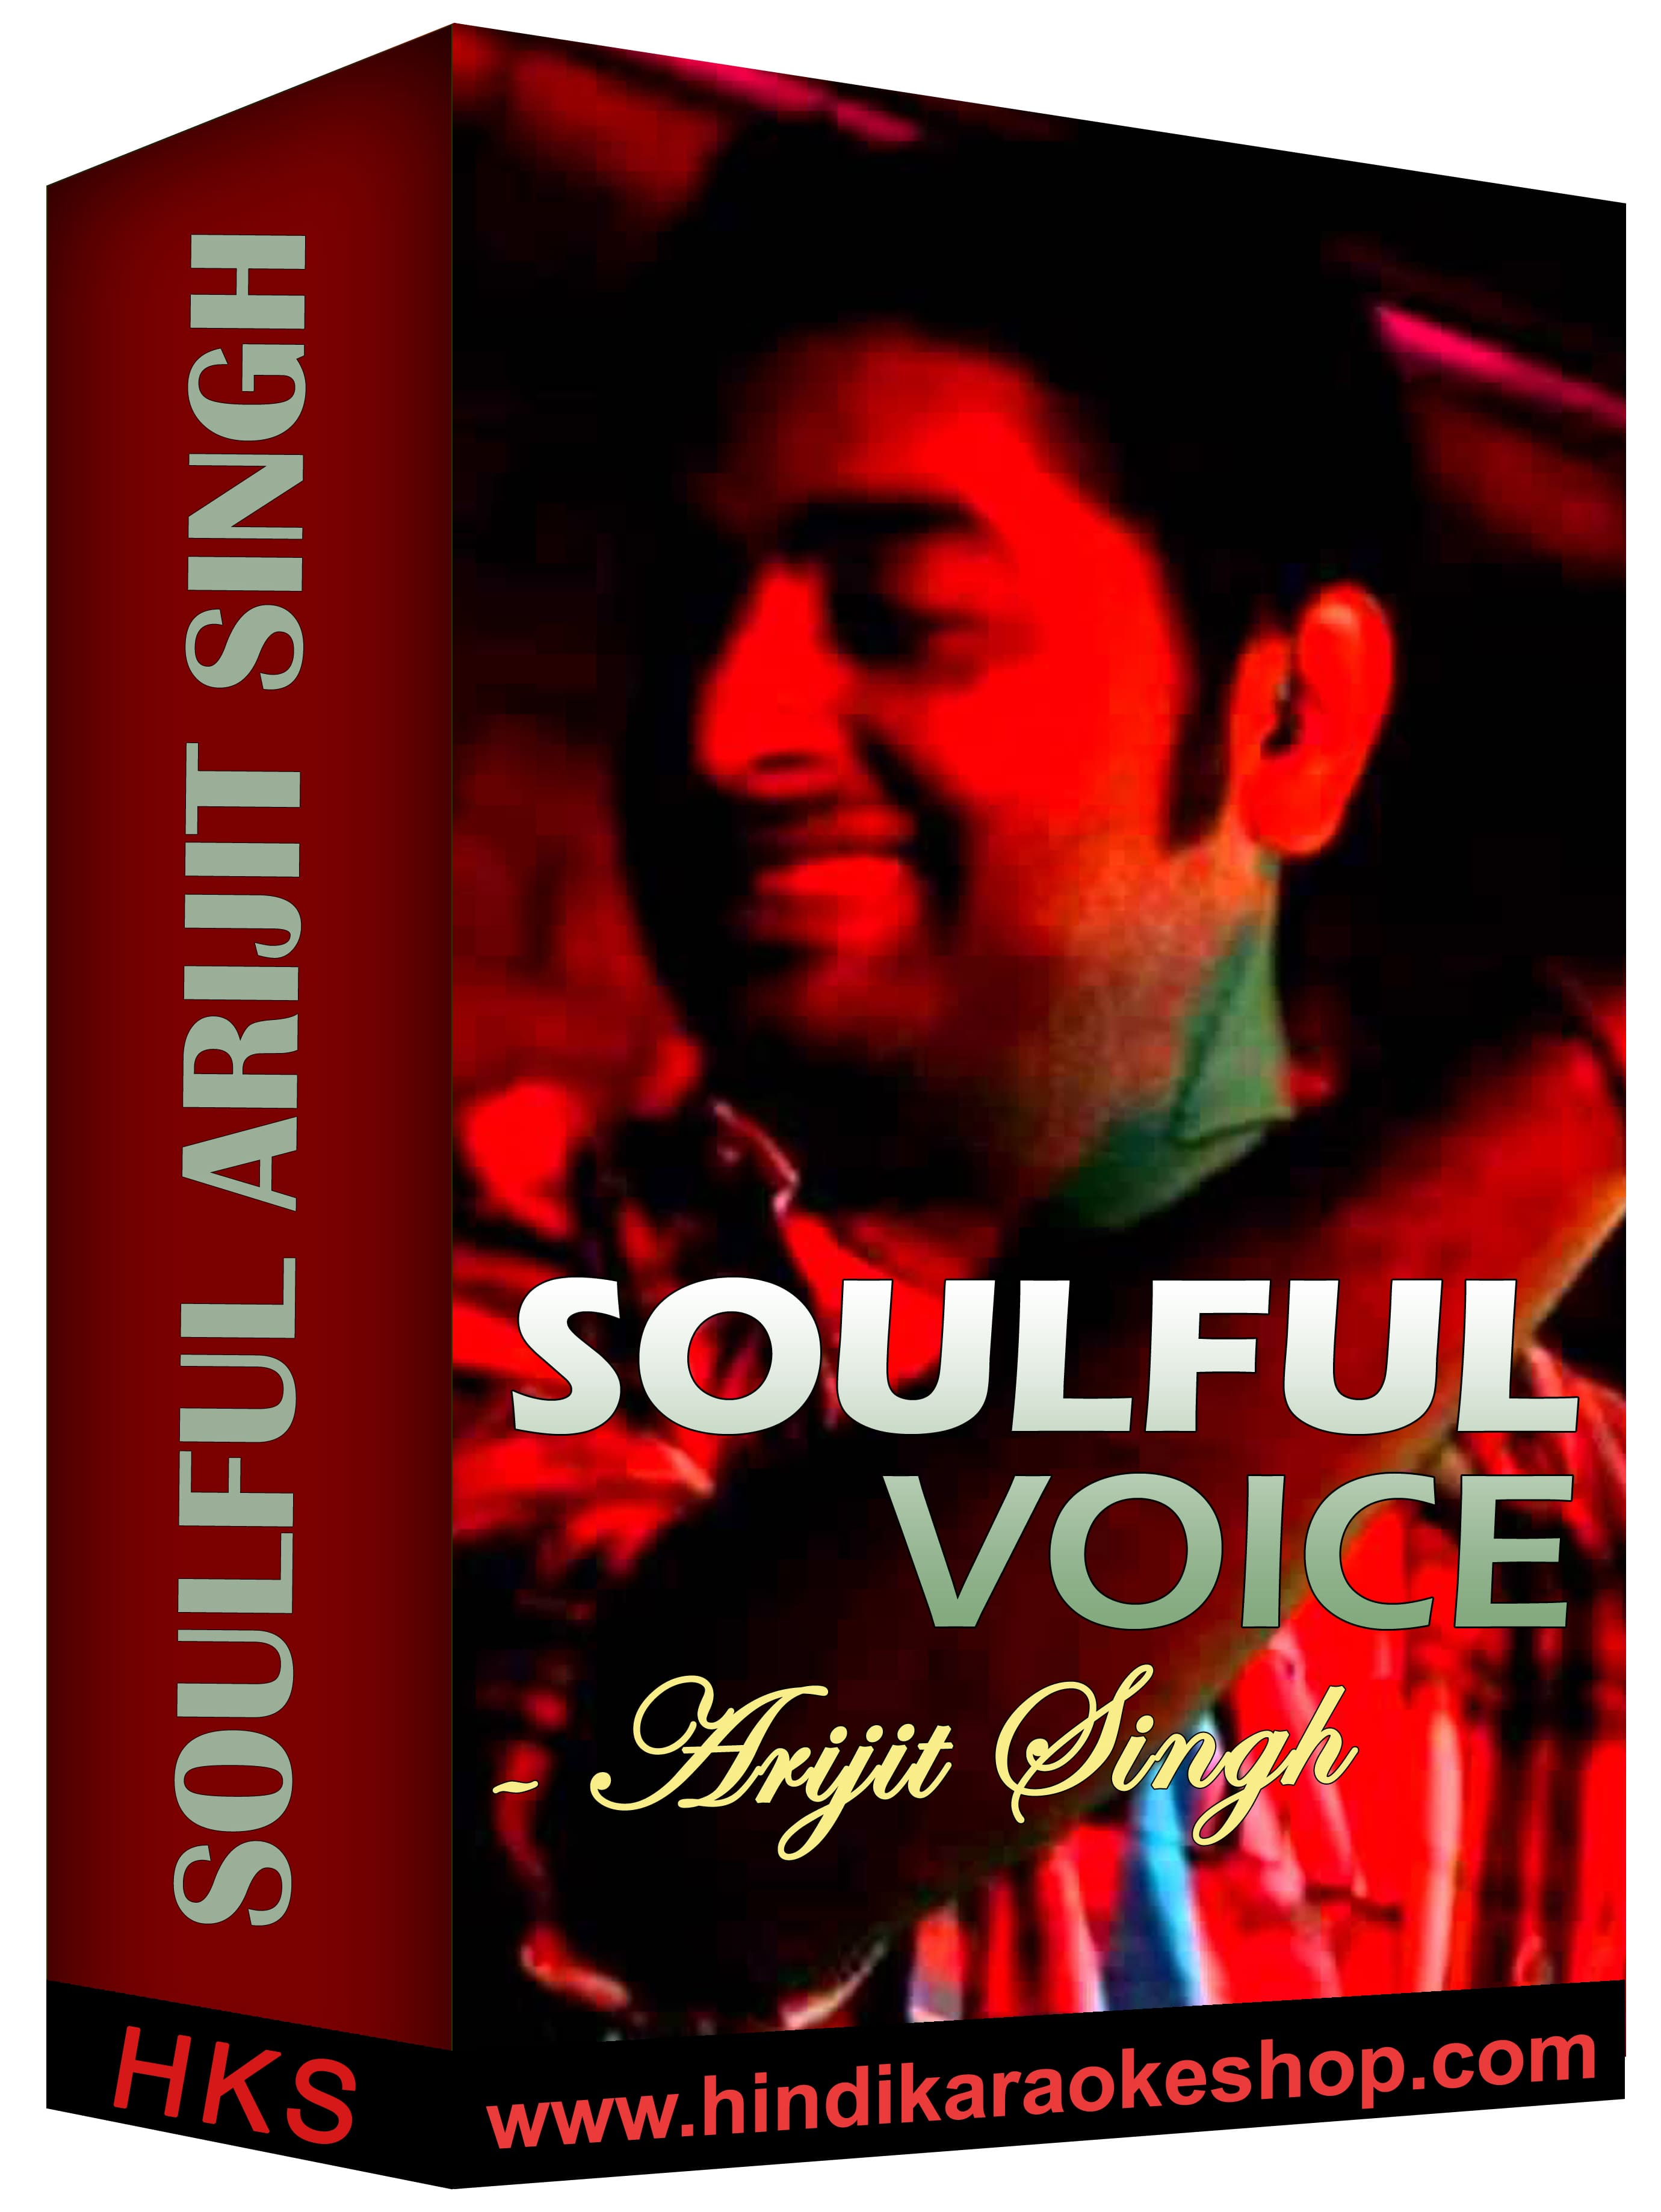 Muskurane Arijit Singh Mp3 Download : muskurane, arijit, singh, download, Arijit, Singh